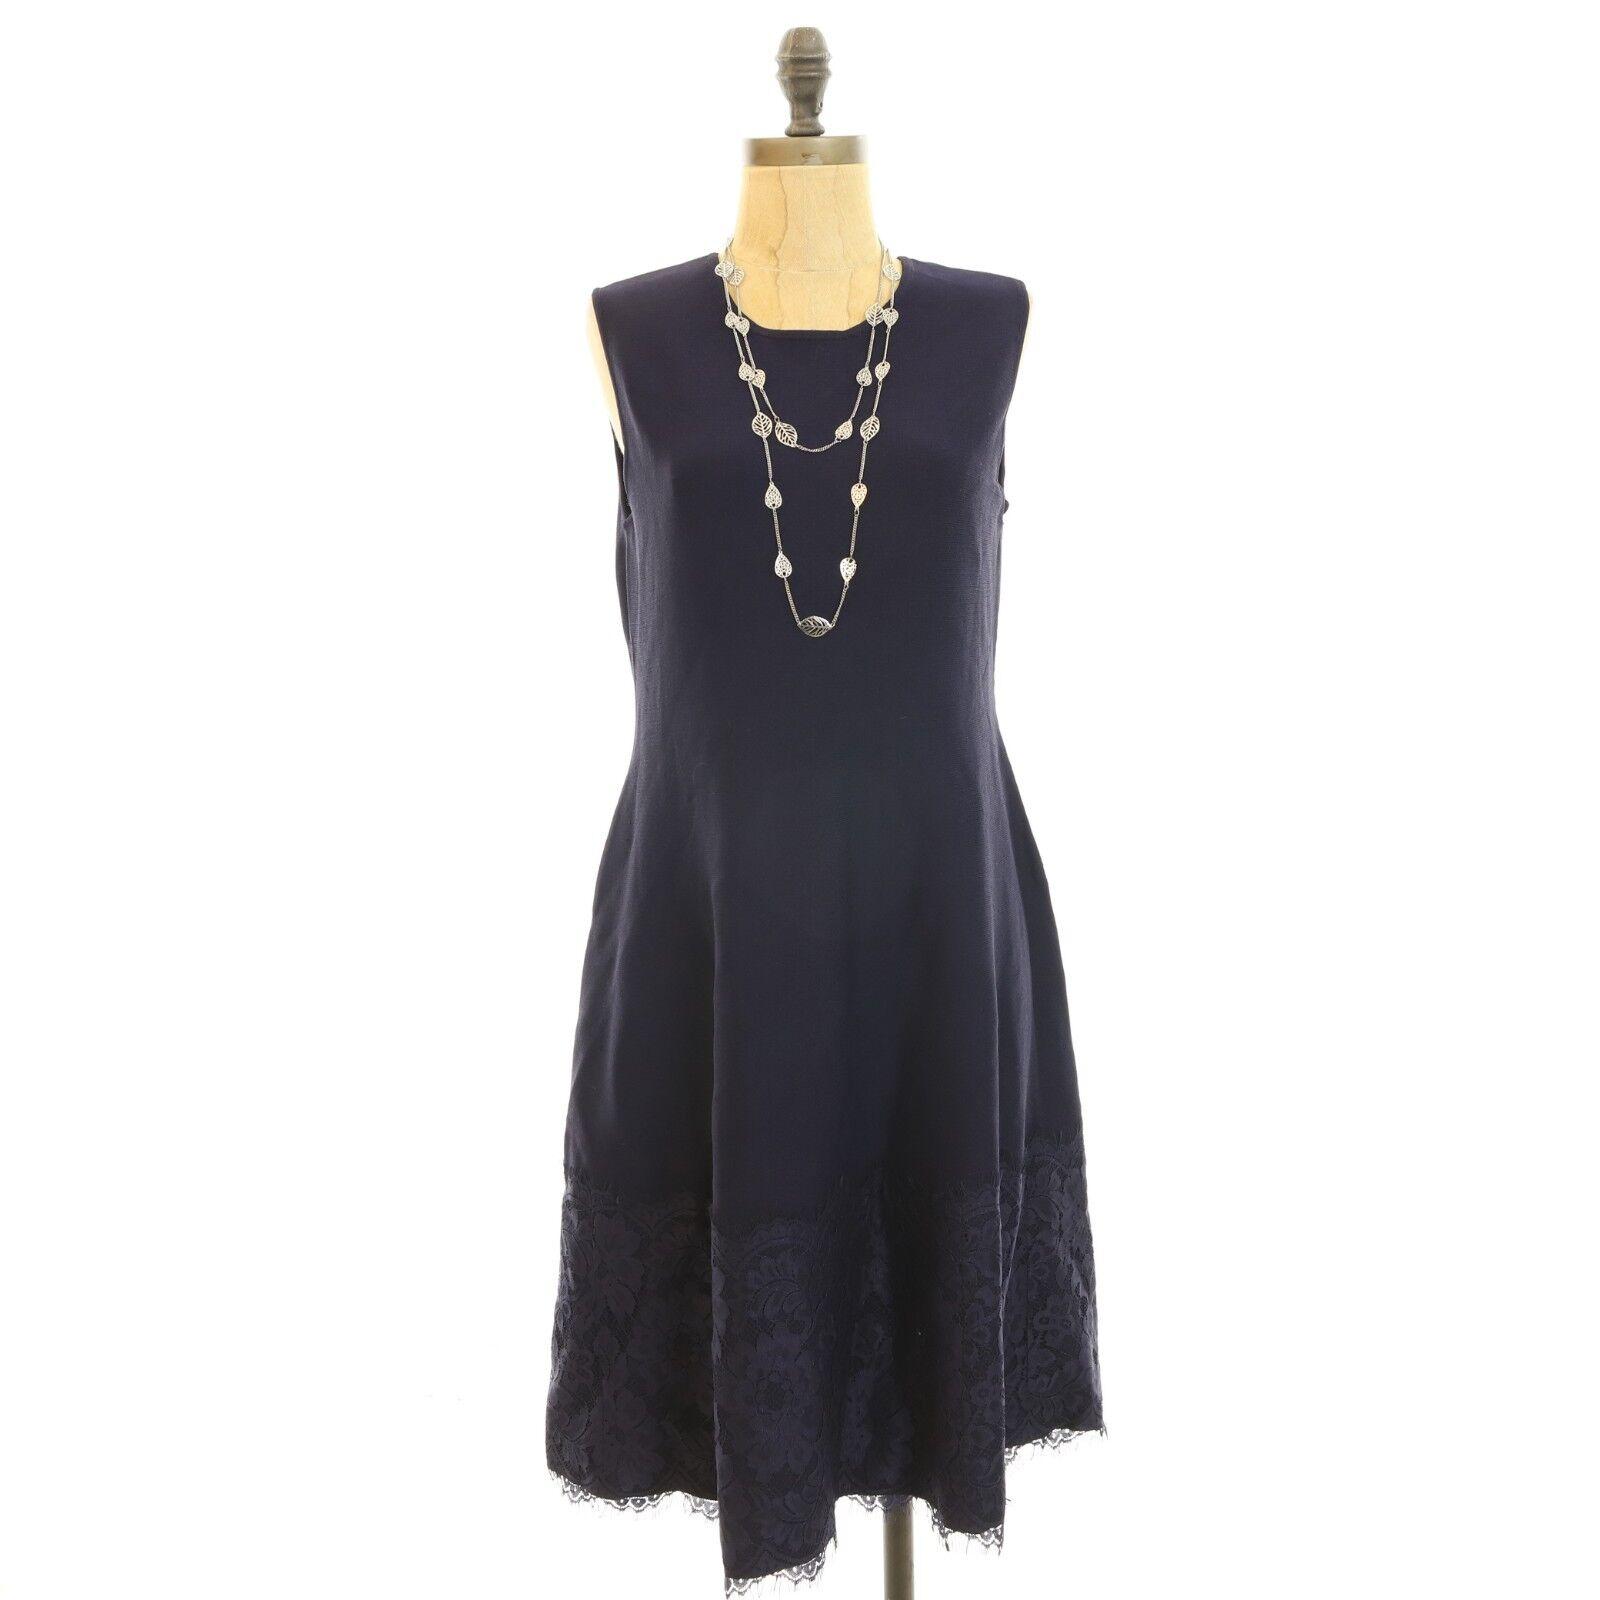 Eliza J Nordstrom Sheath Dress Size L Lace Hem Sleeveless Navy bluee  B87